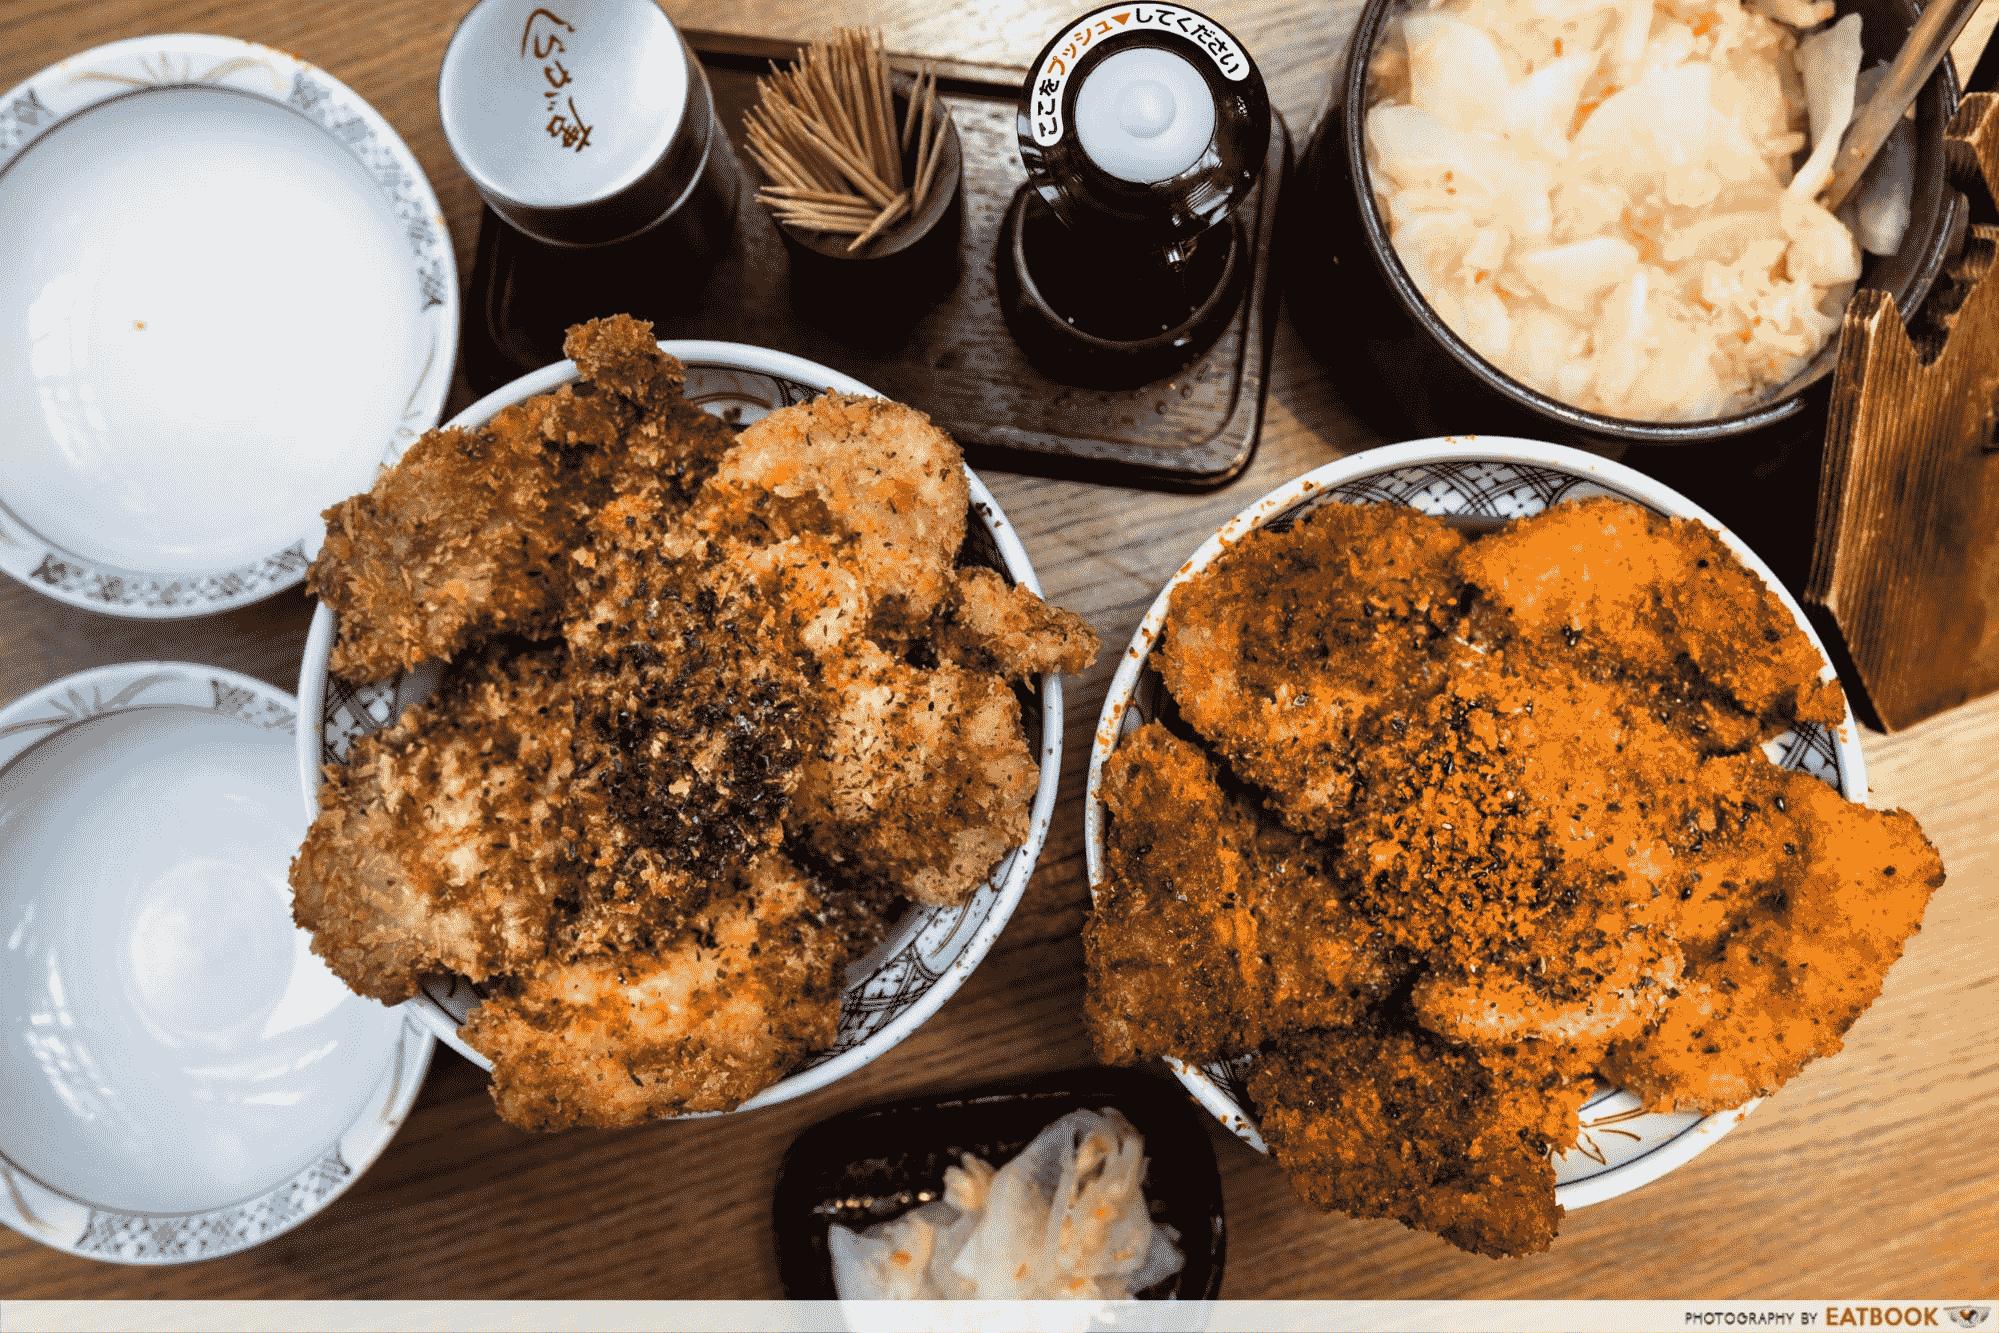 Promenade Food Places - Katsudon Hanakatsu